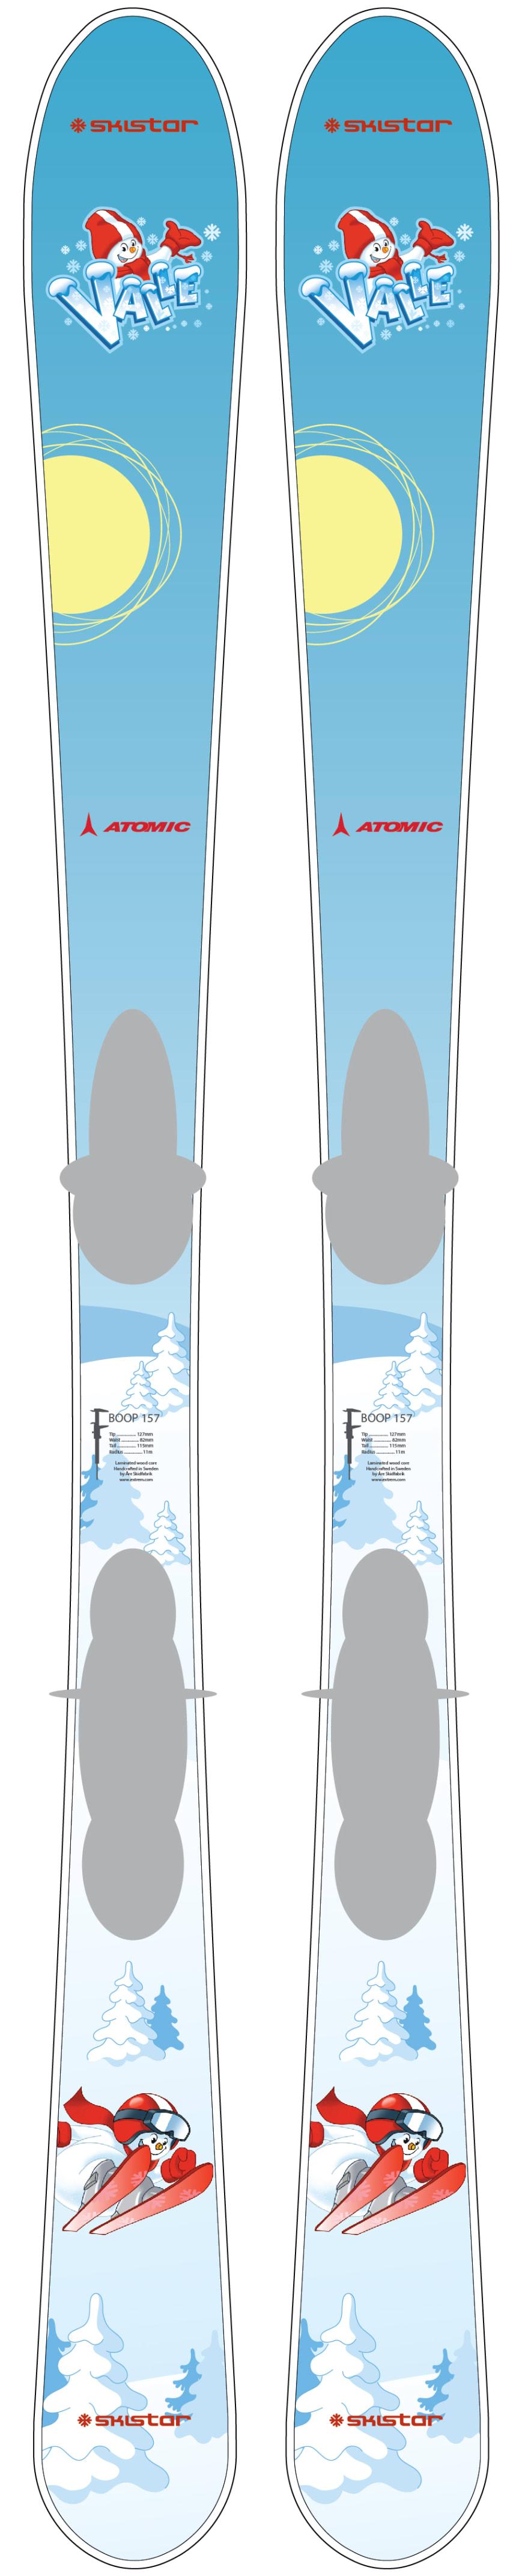 Valles Skipakke